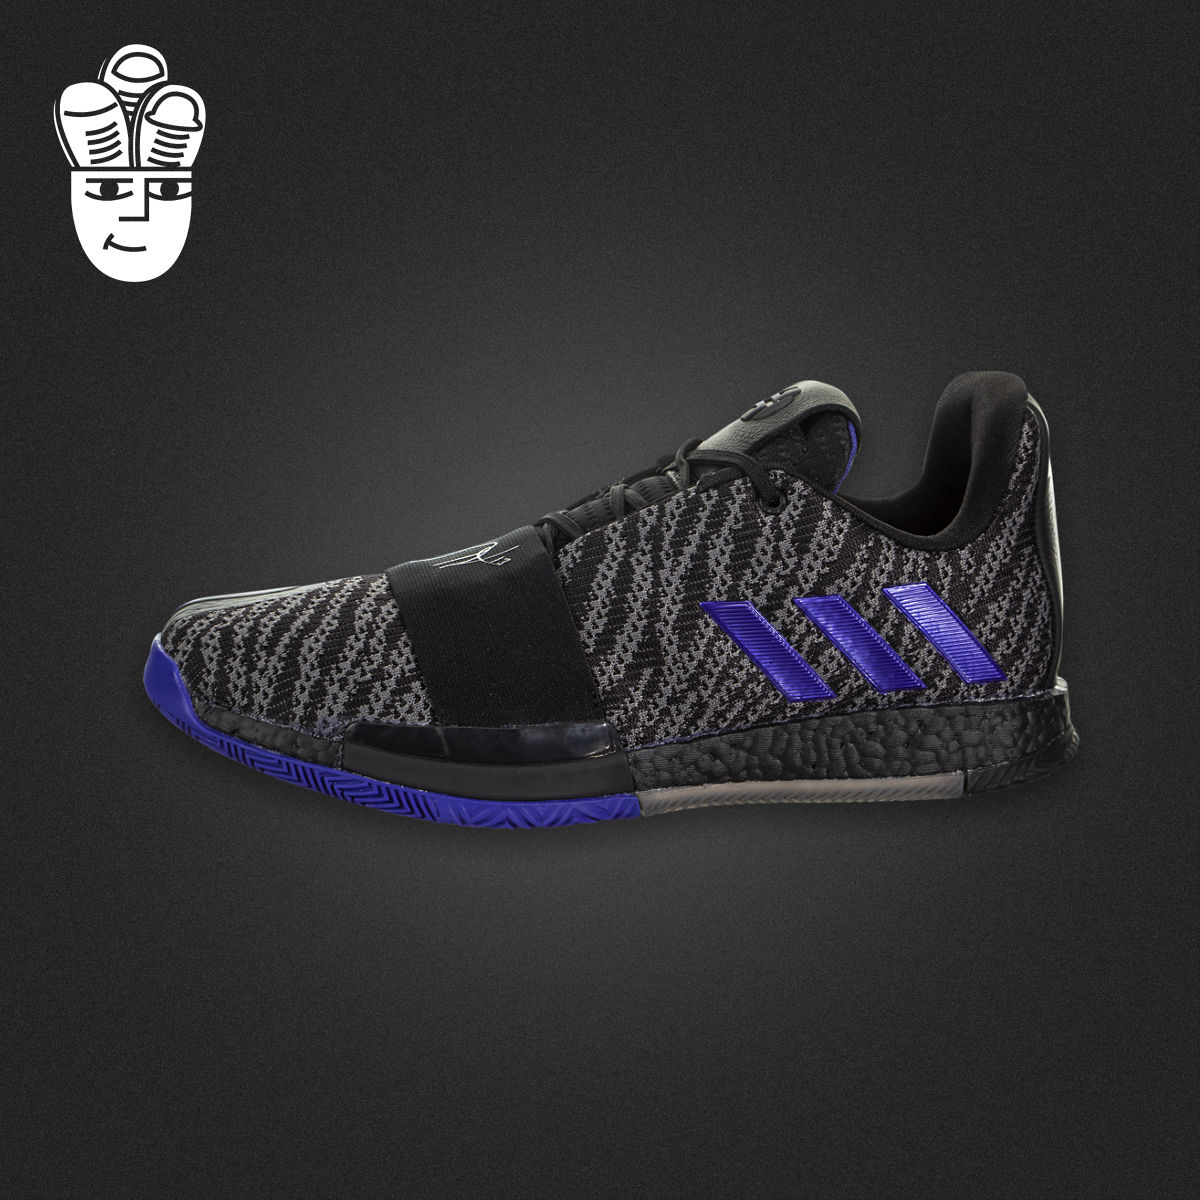 Adidas Harden Vol. 3阿迪达斯篮球鞋 哈登3代签名鞋 g26811